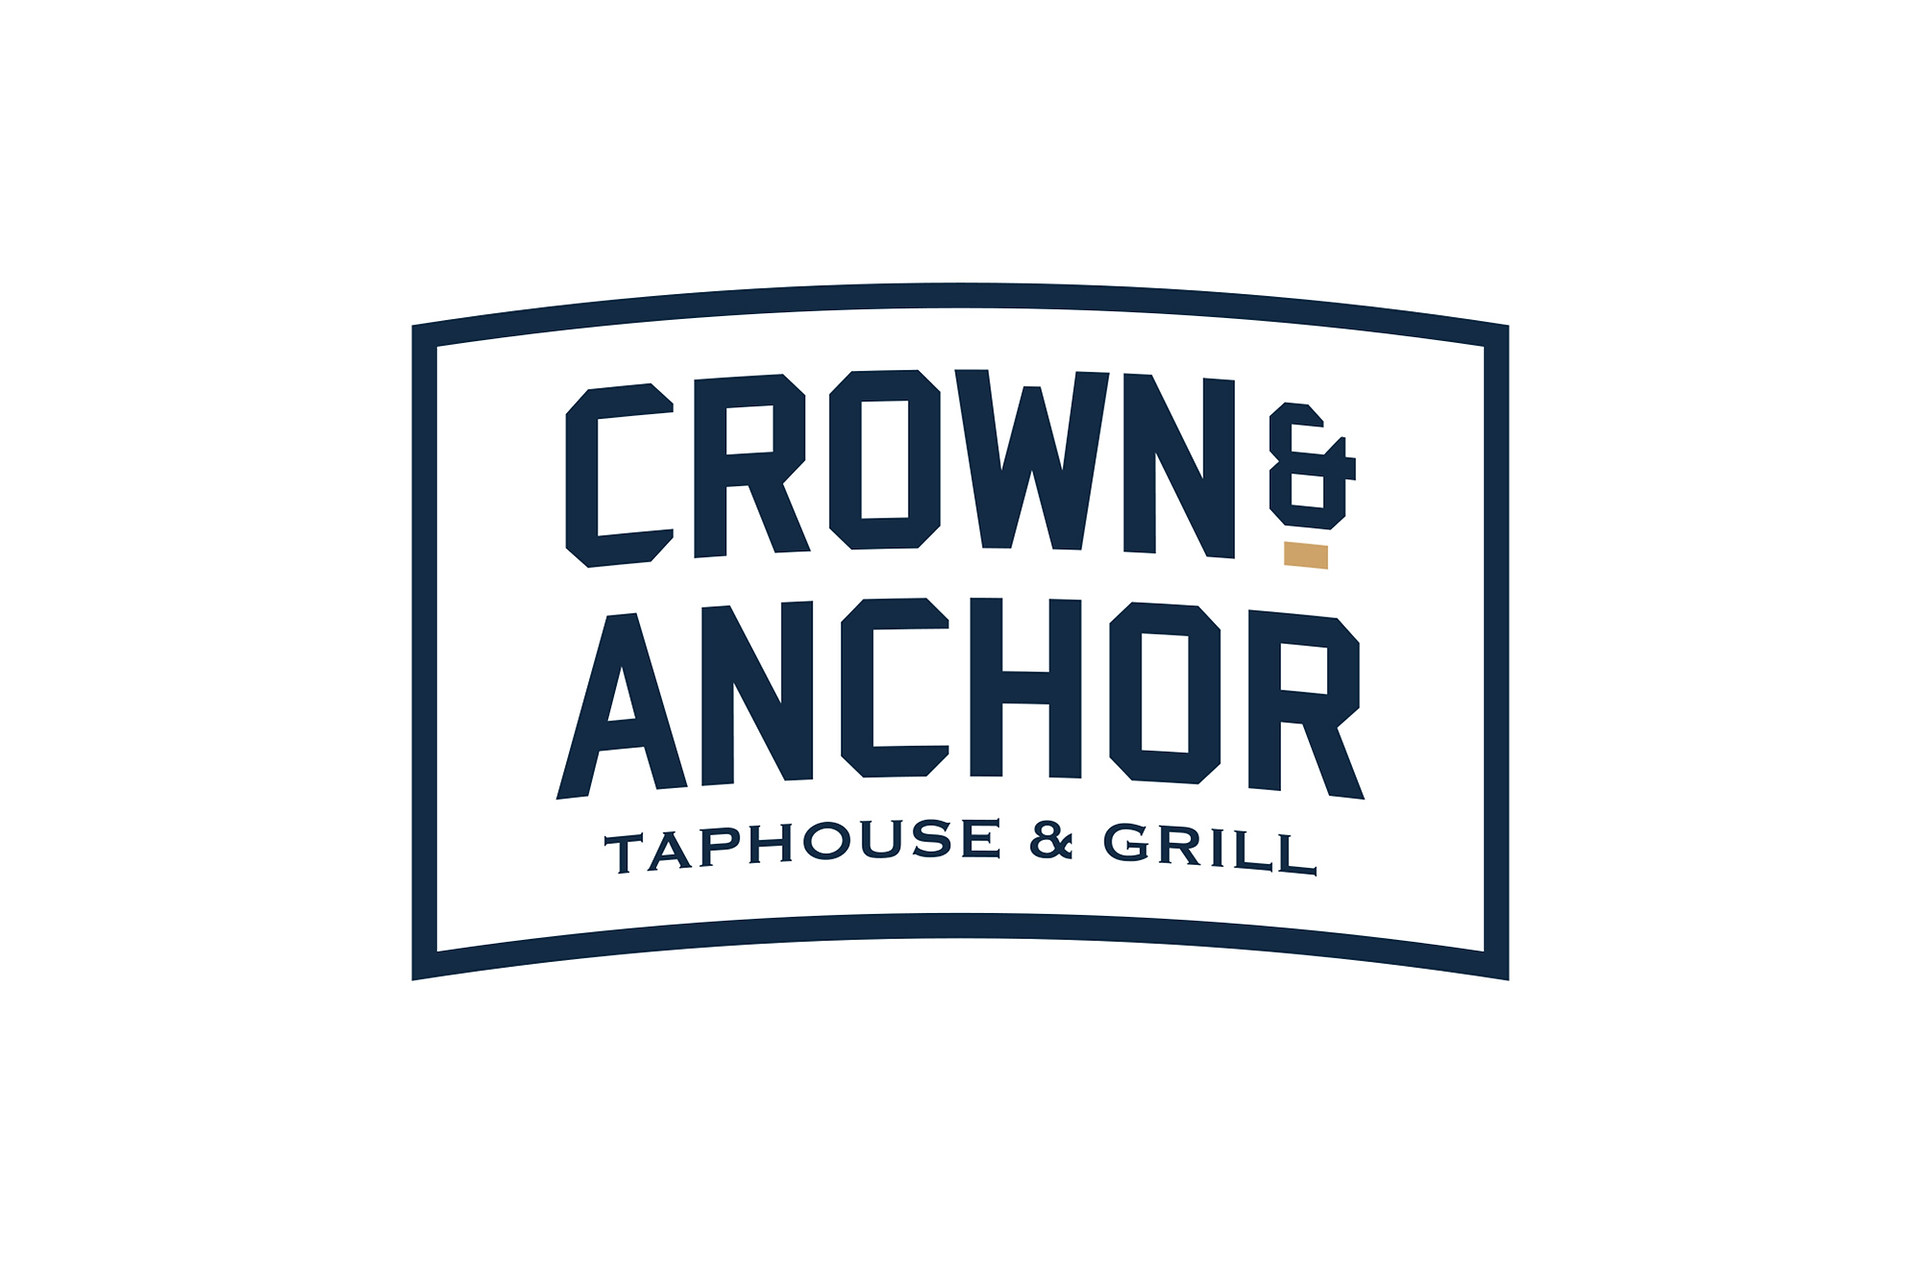 crown-&-Anchor-logo20-copy-9.jpg